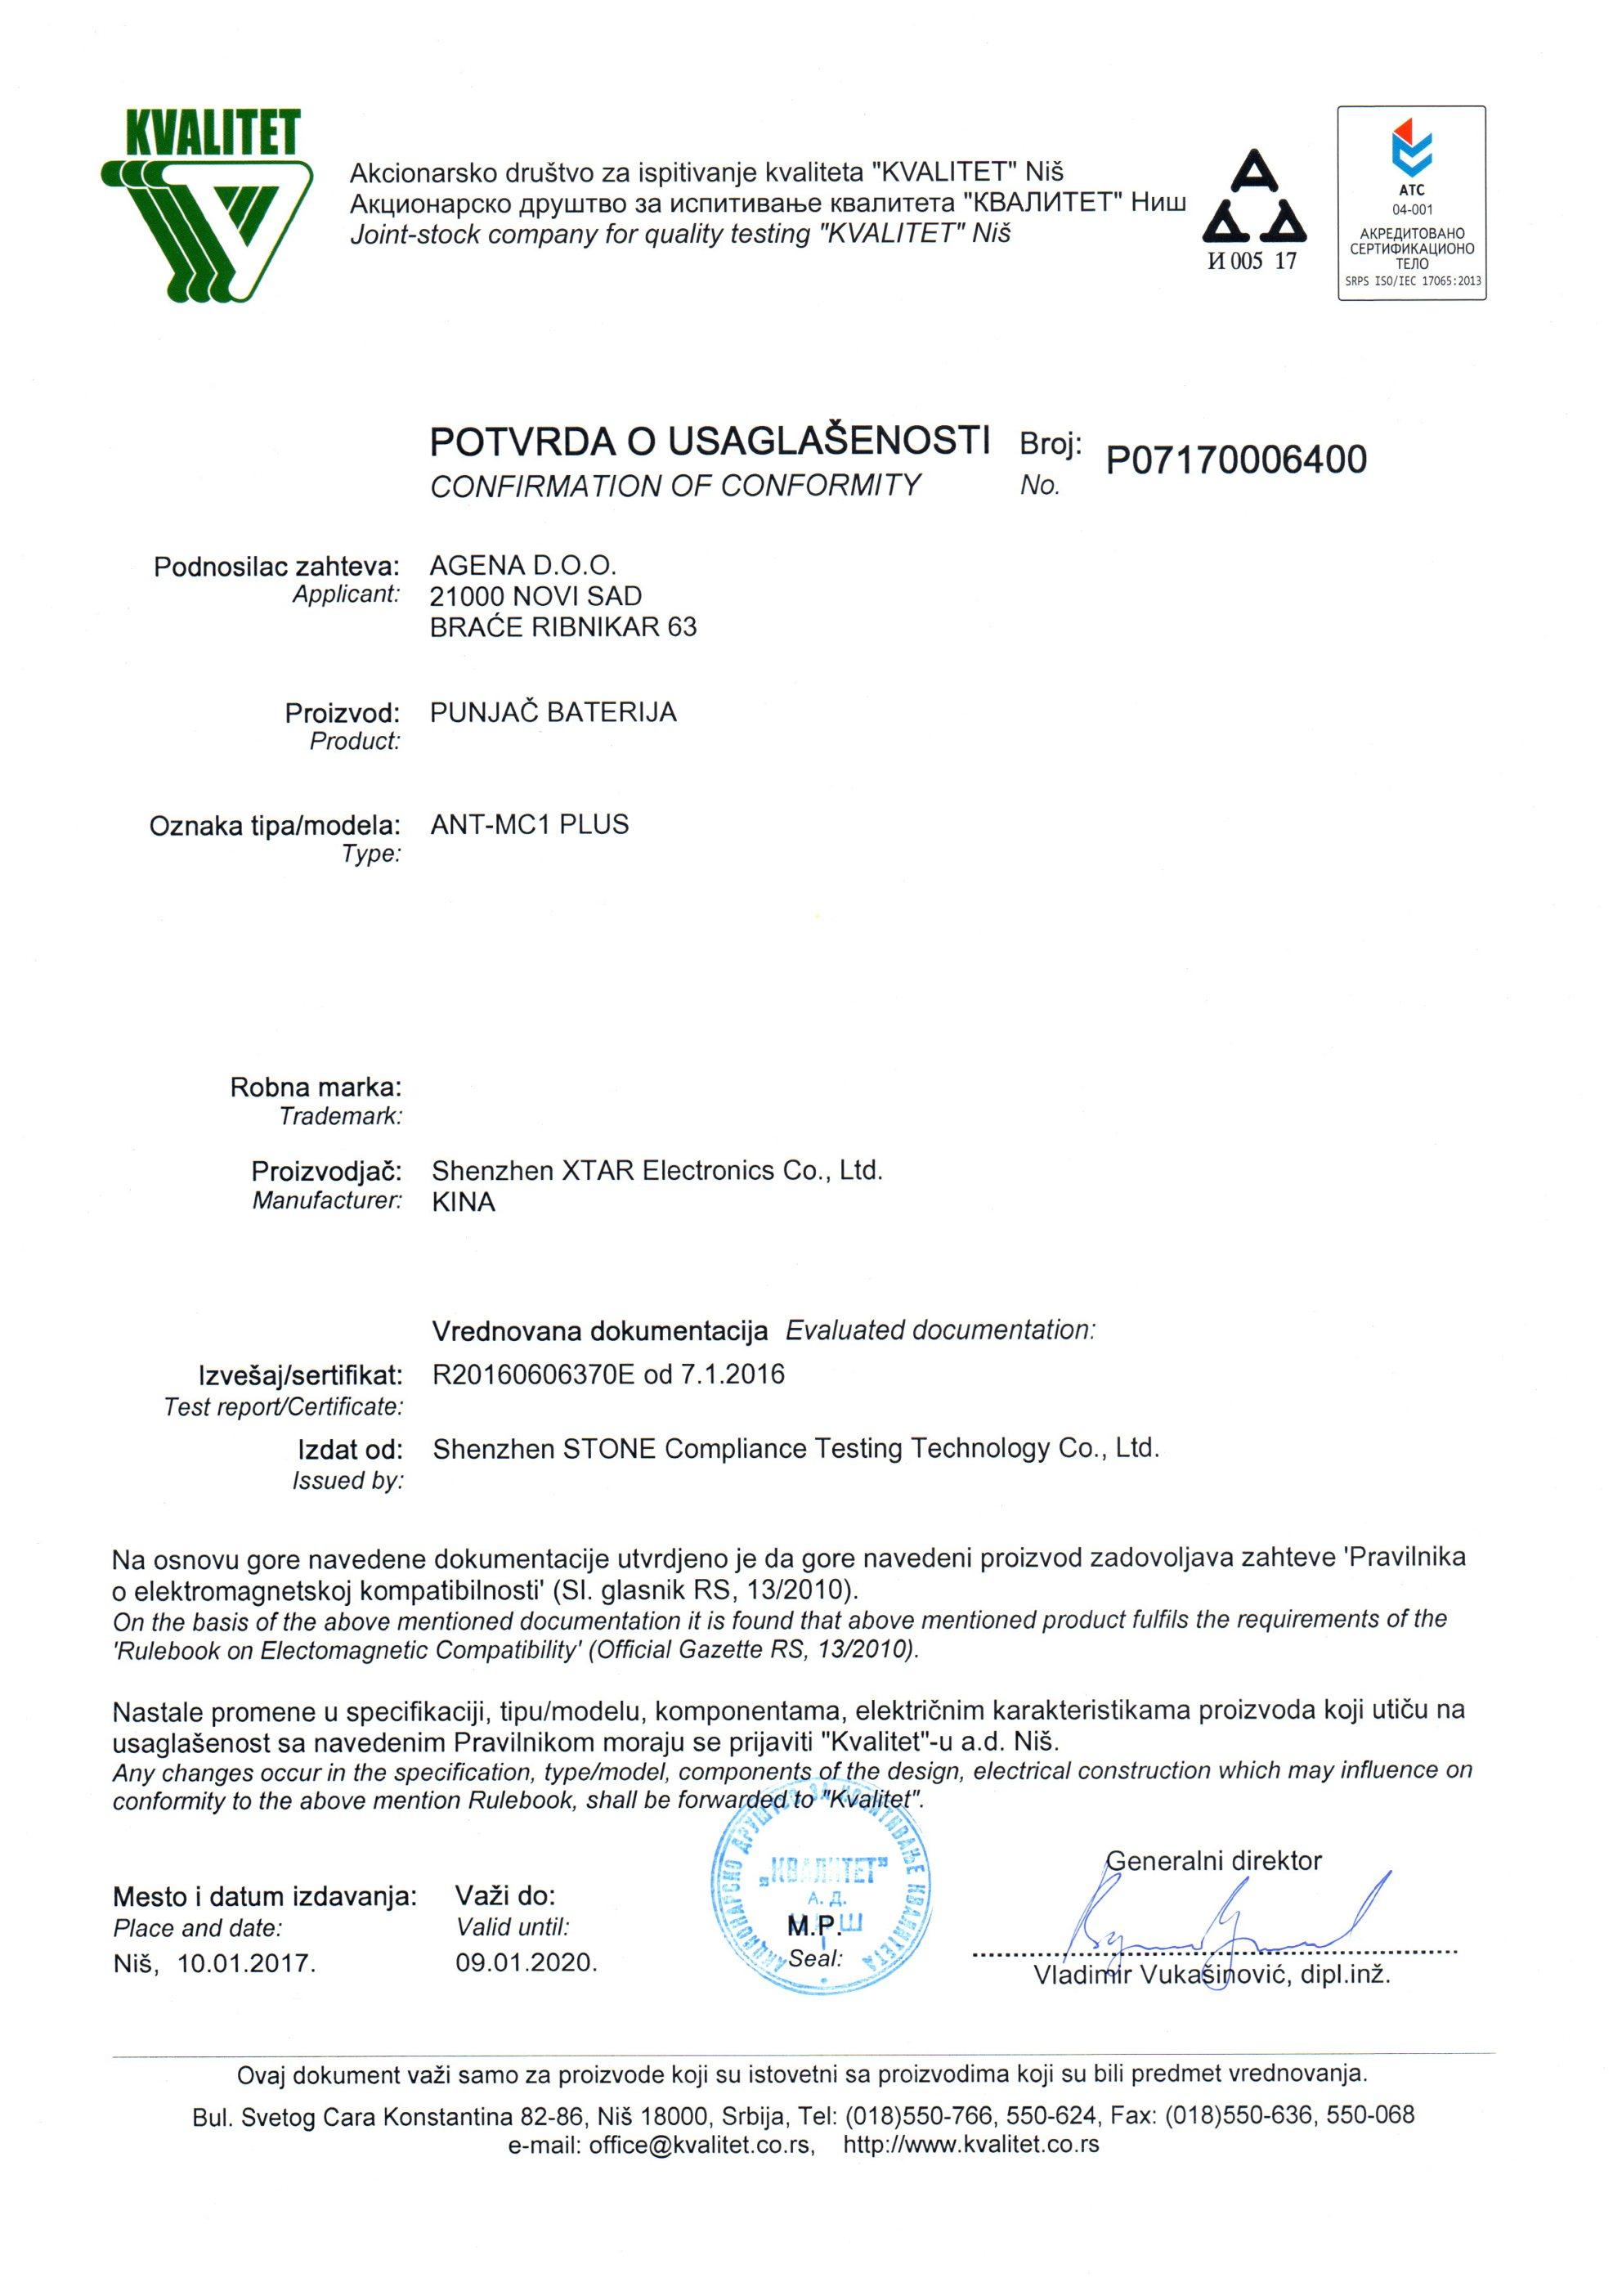 ANT-MC1 Plus EMC potvrda o usaglašenosti